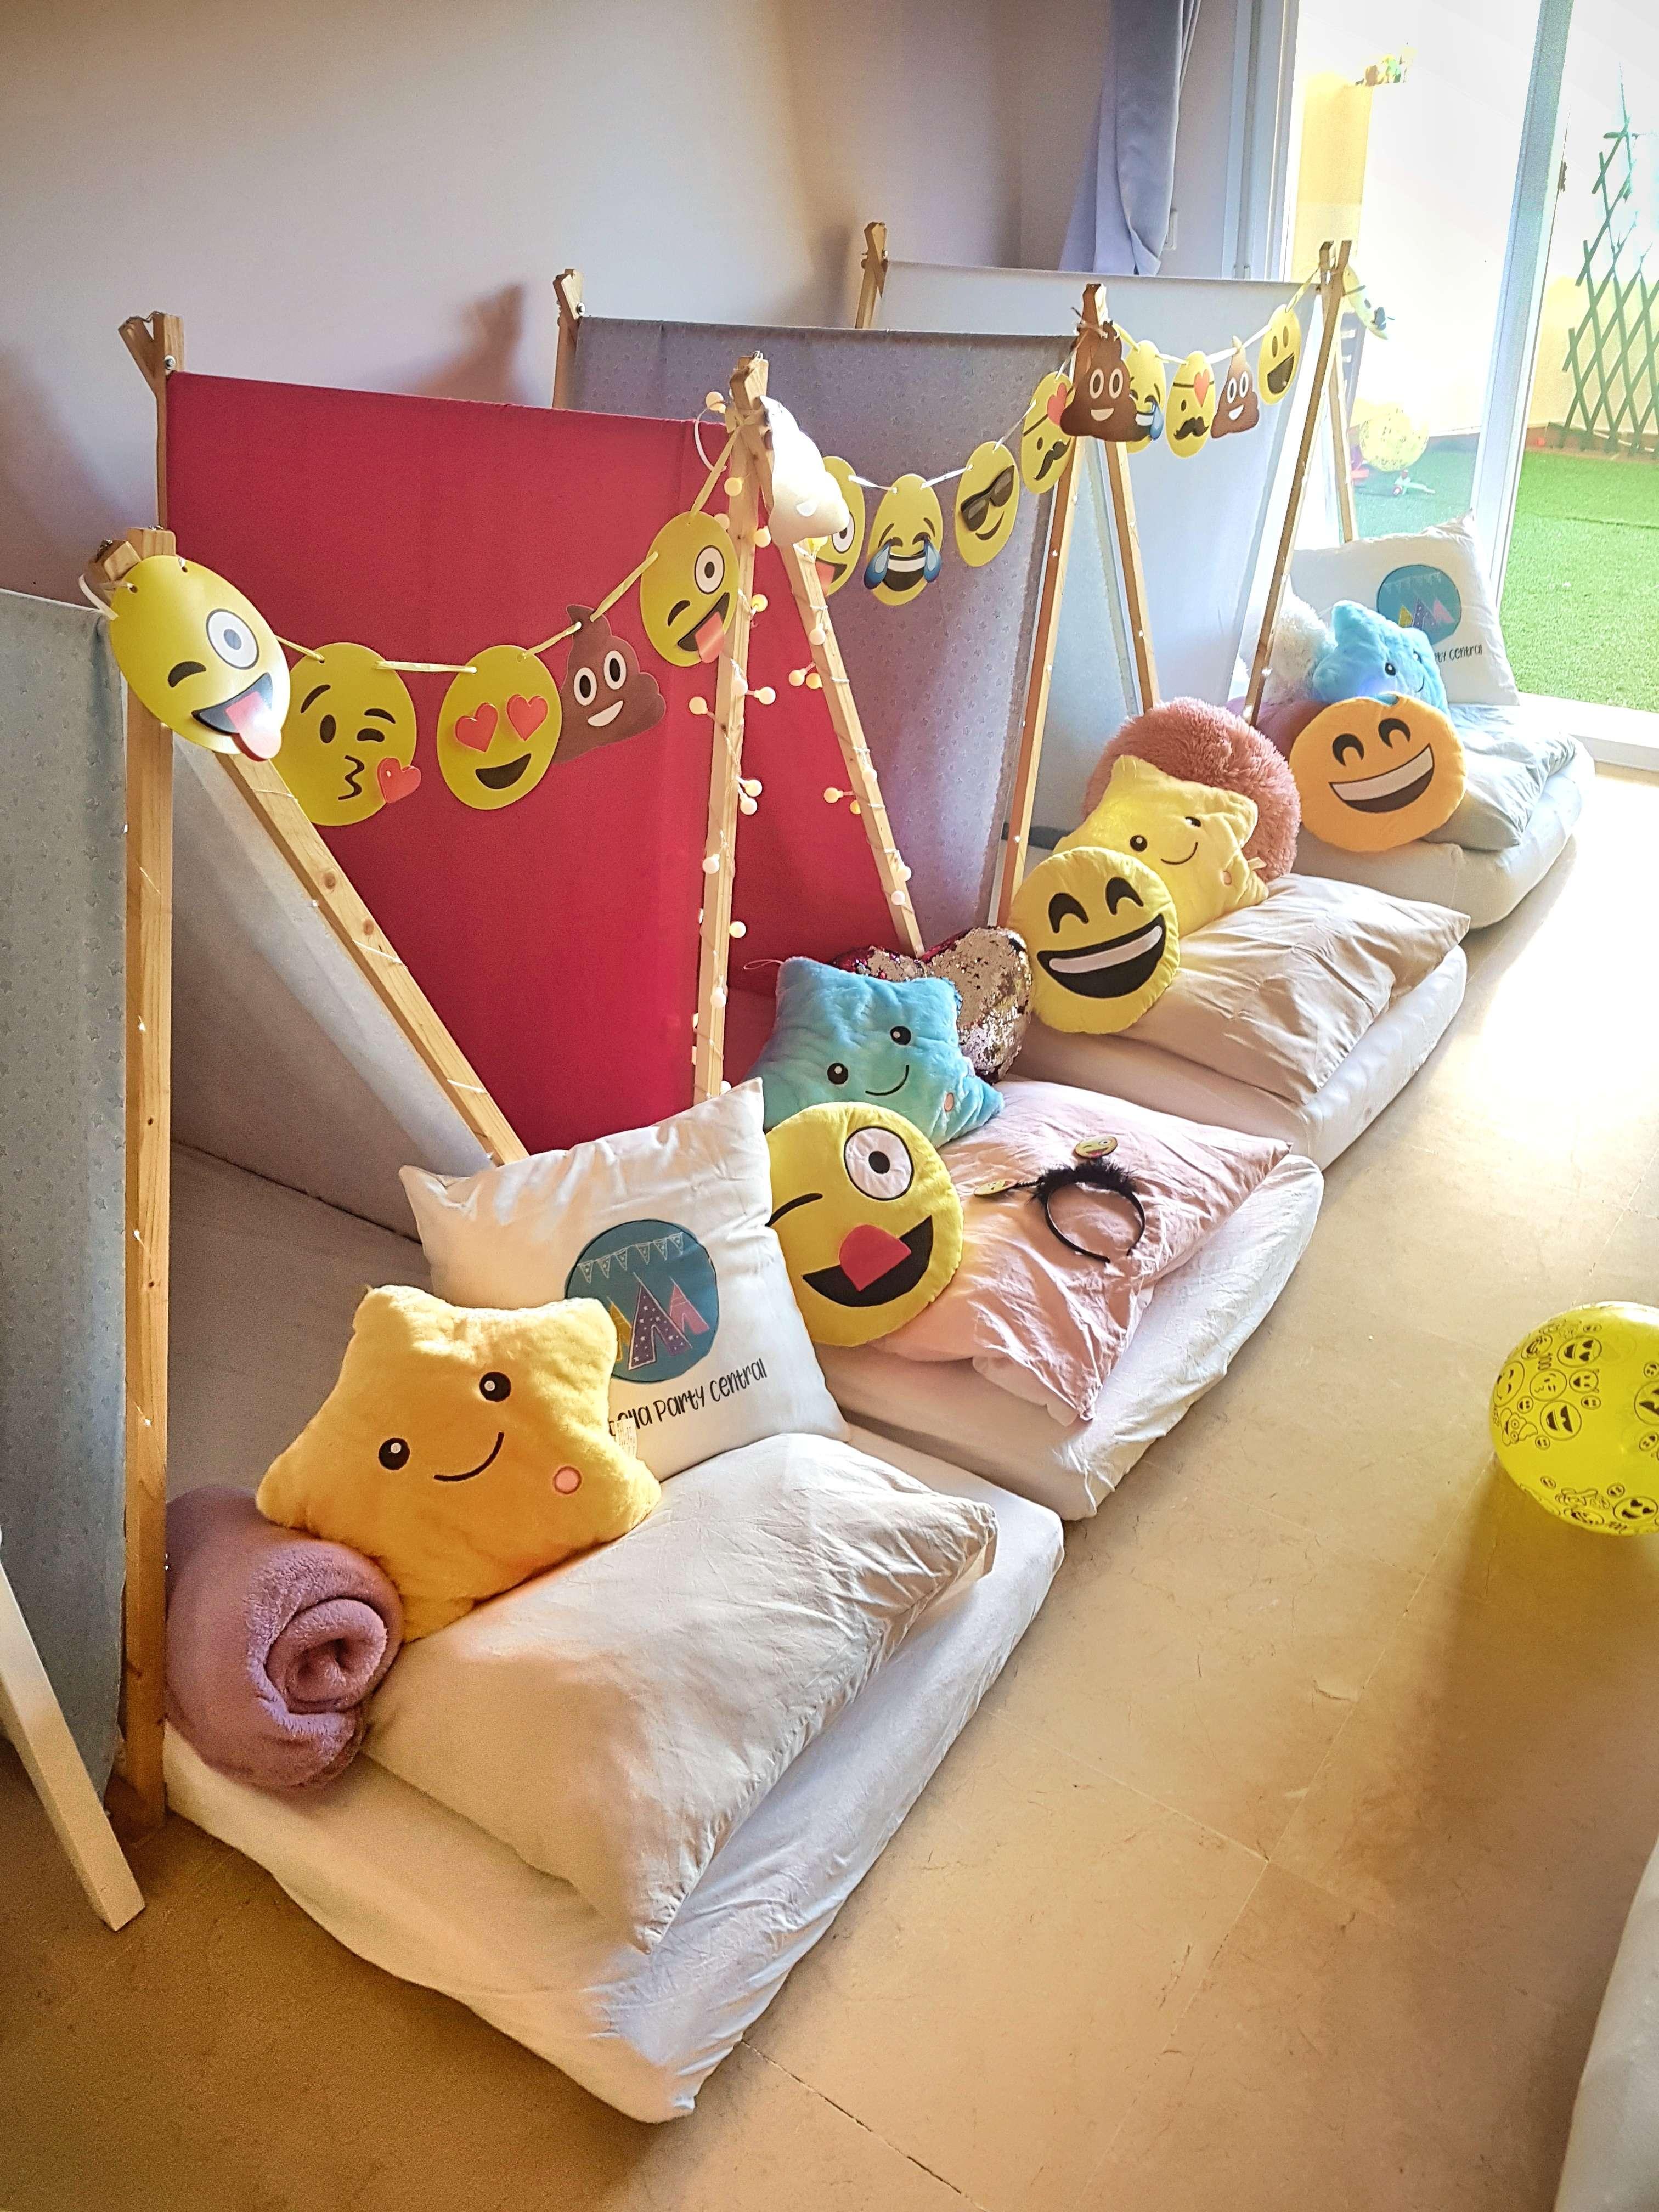 Emoji sleepover party